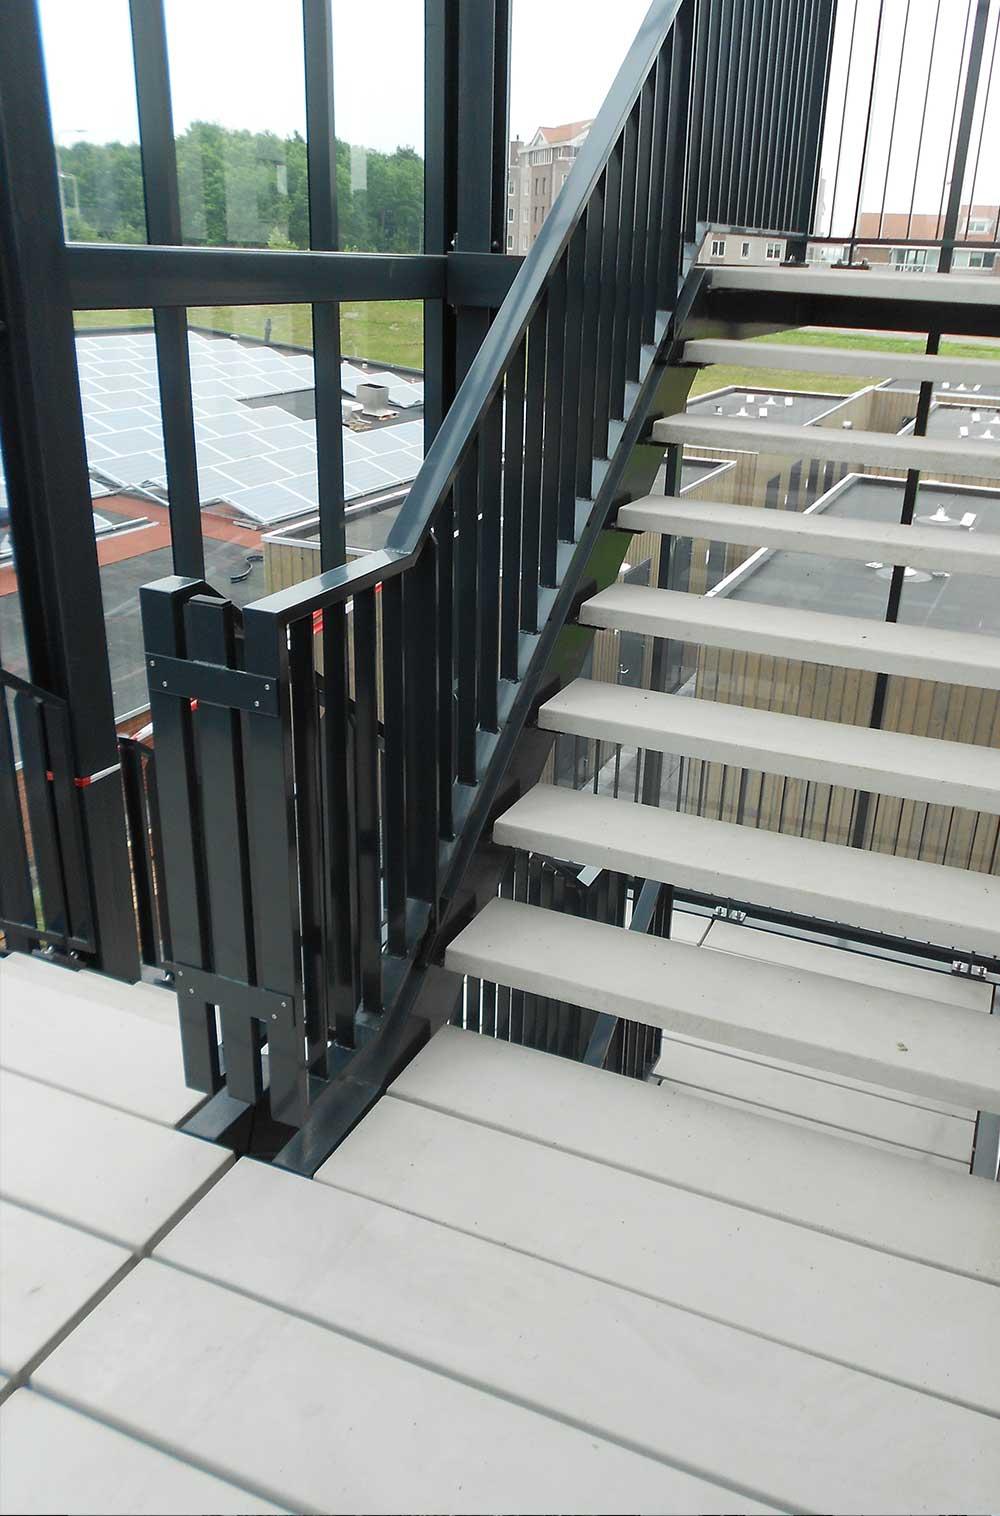 Palthelaan trappen